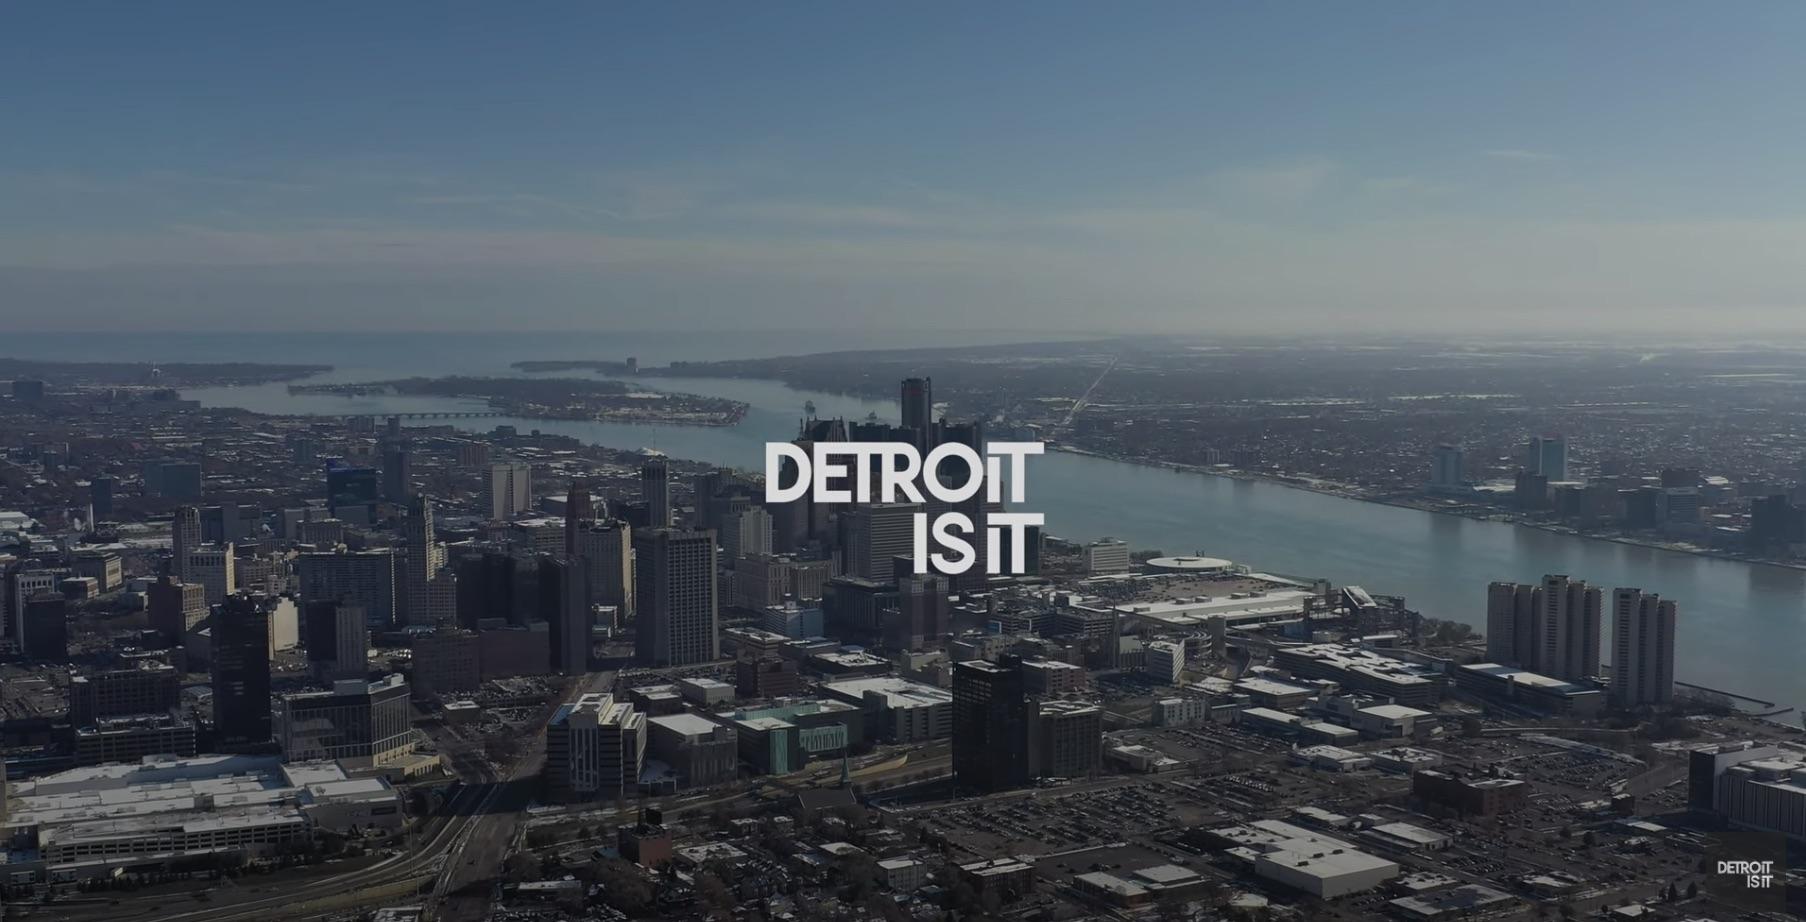 Culture. Community. Innovation. Design, in Detroit 13